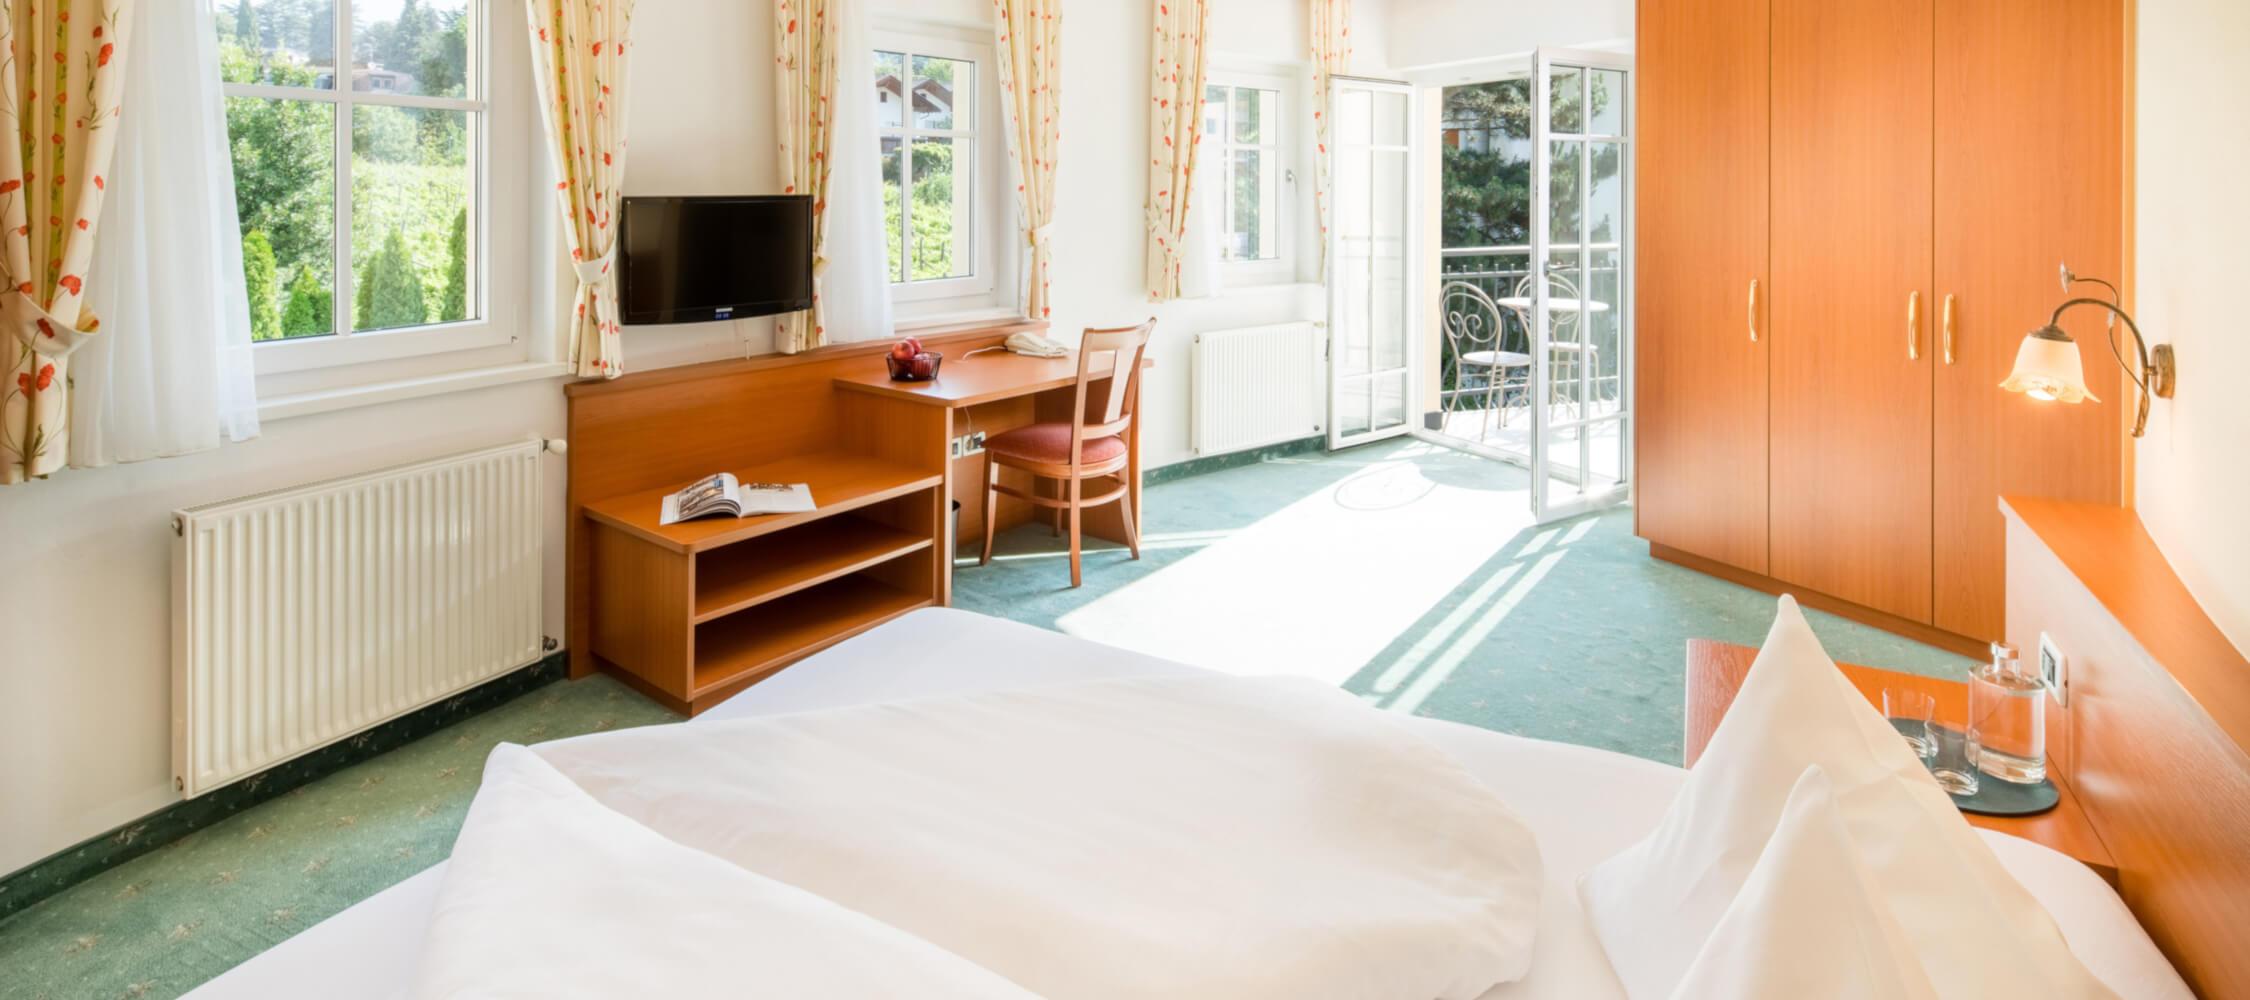 Hotel-Villa-Laurus-Merano-Rooms-Doppelzimmer-Deluxe-Vita-201-FlorianBusch-4-2250x1000